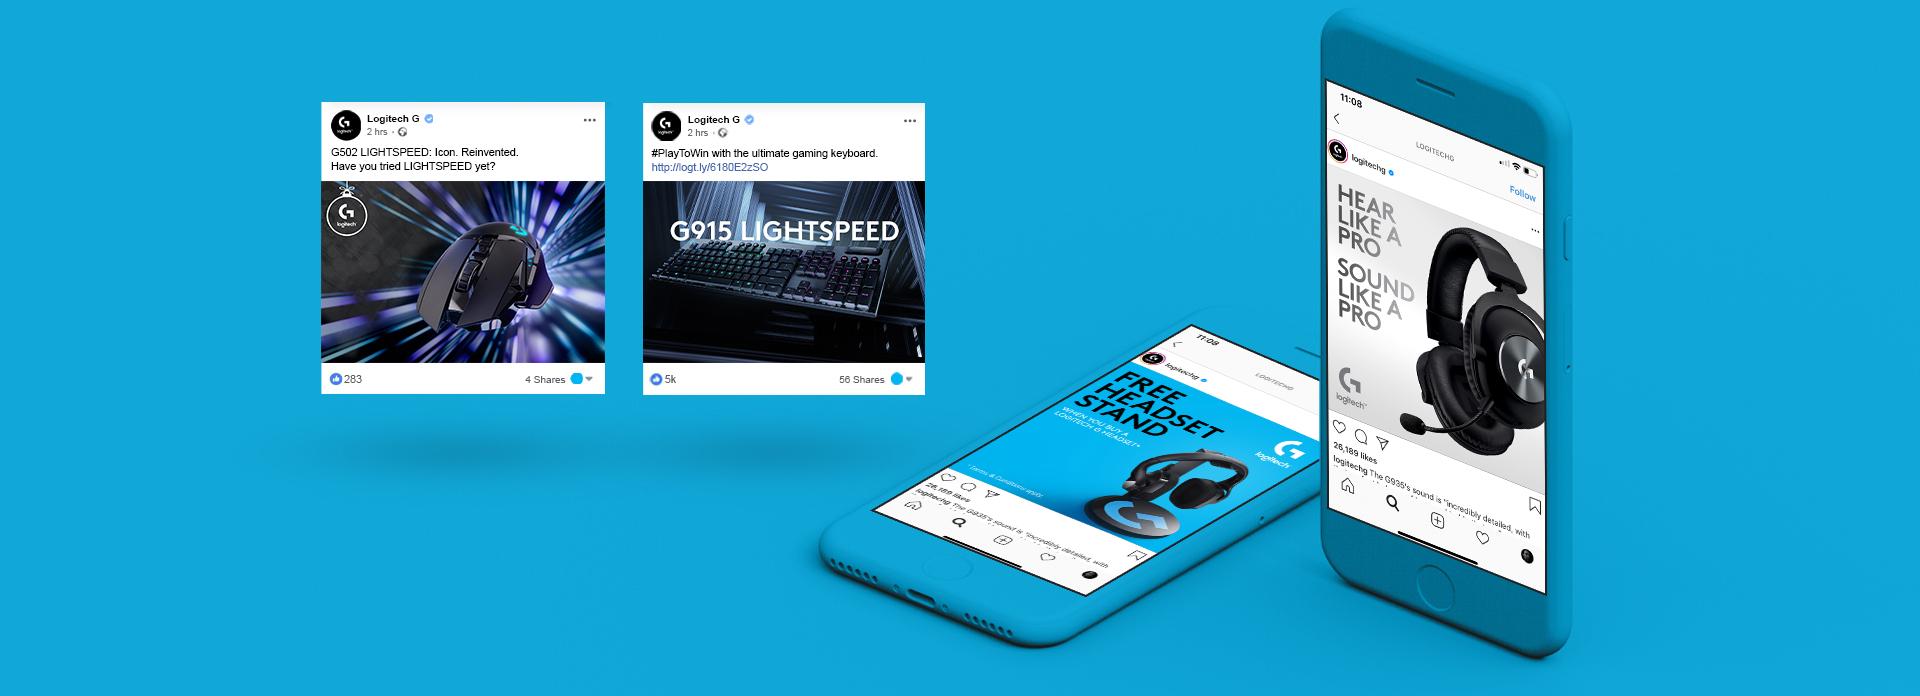 LogiG-social-showcase